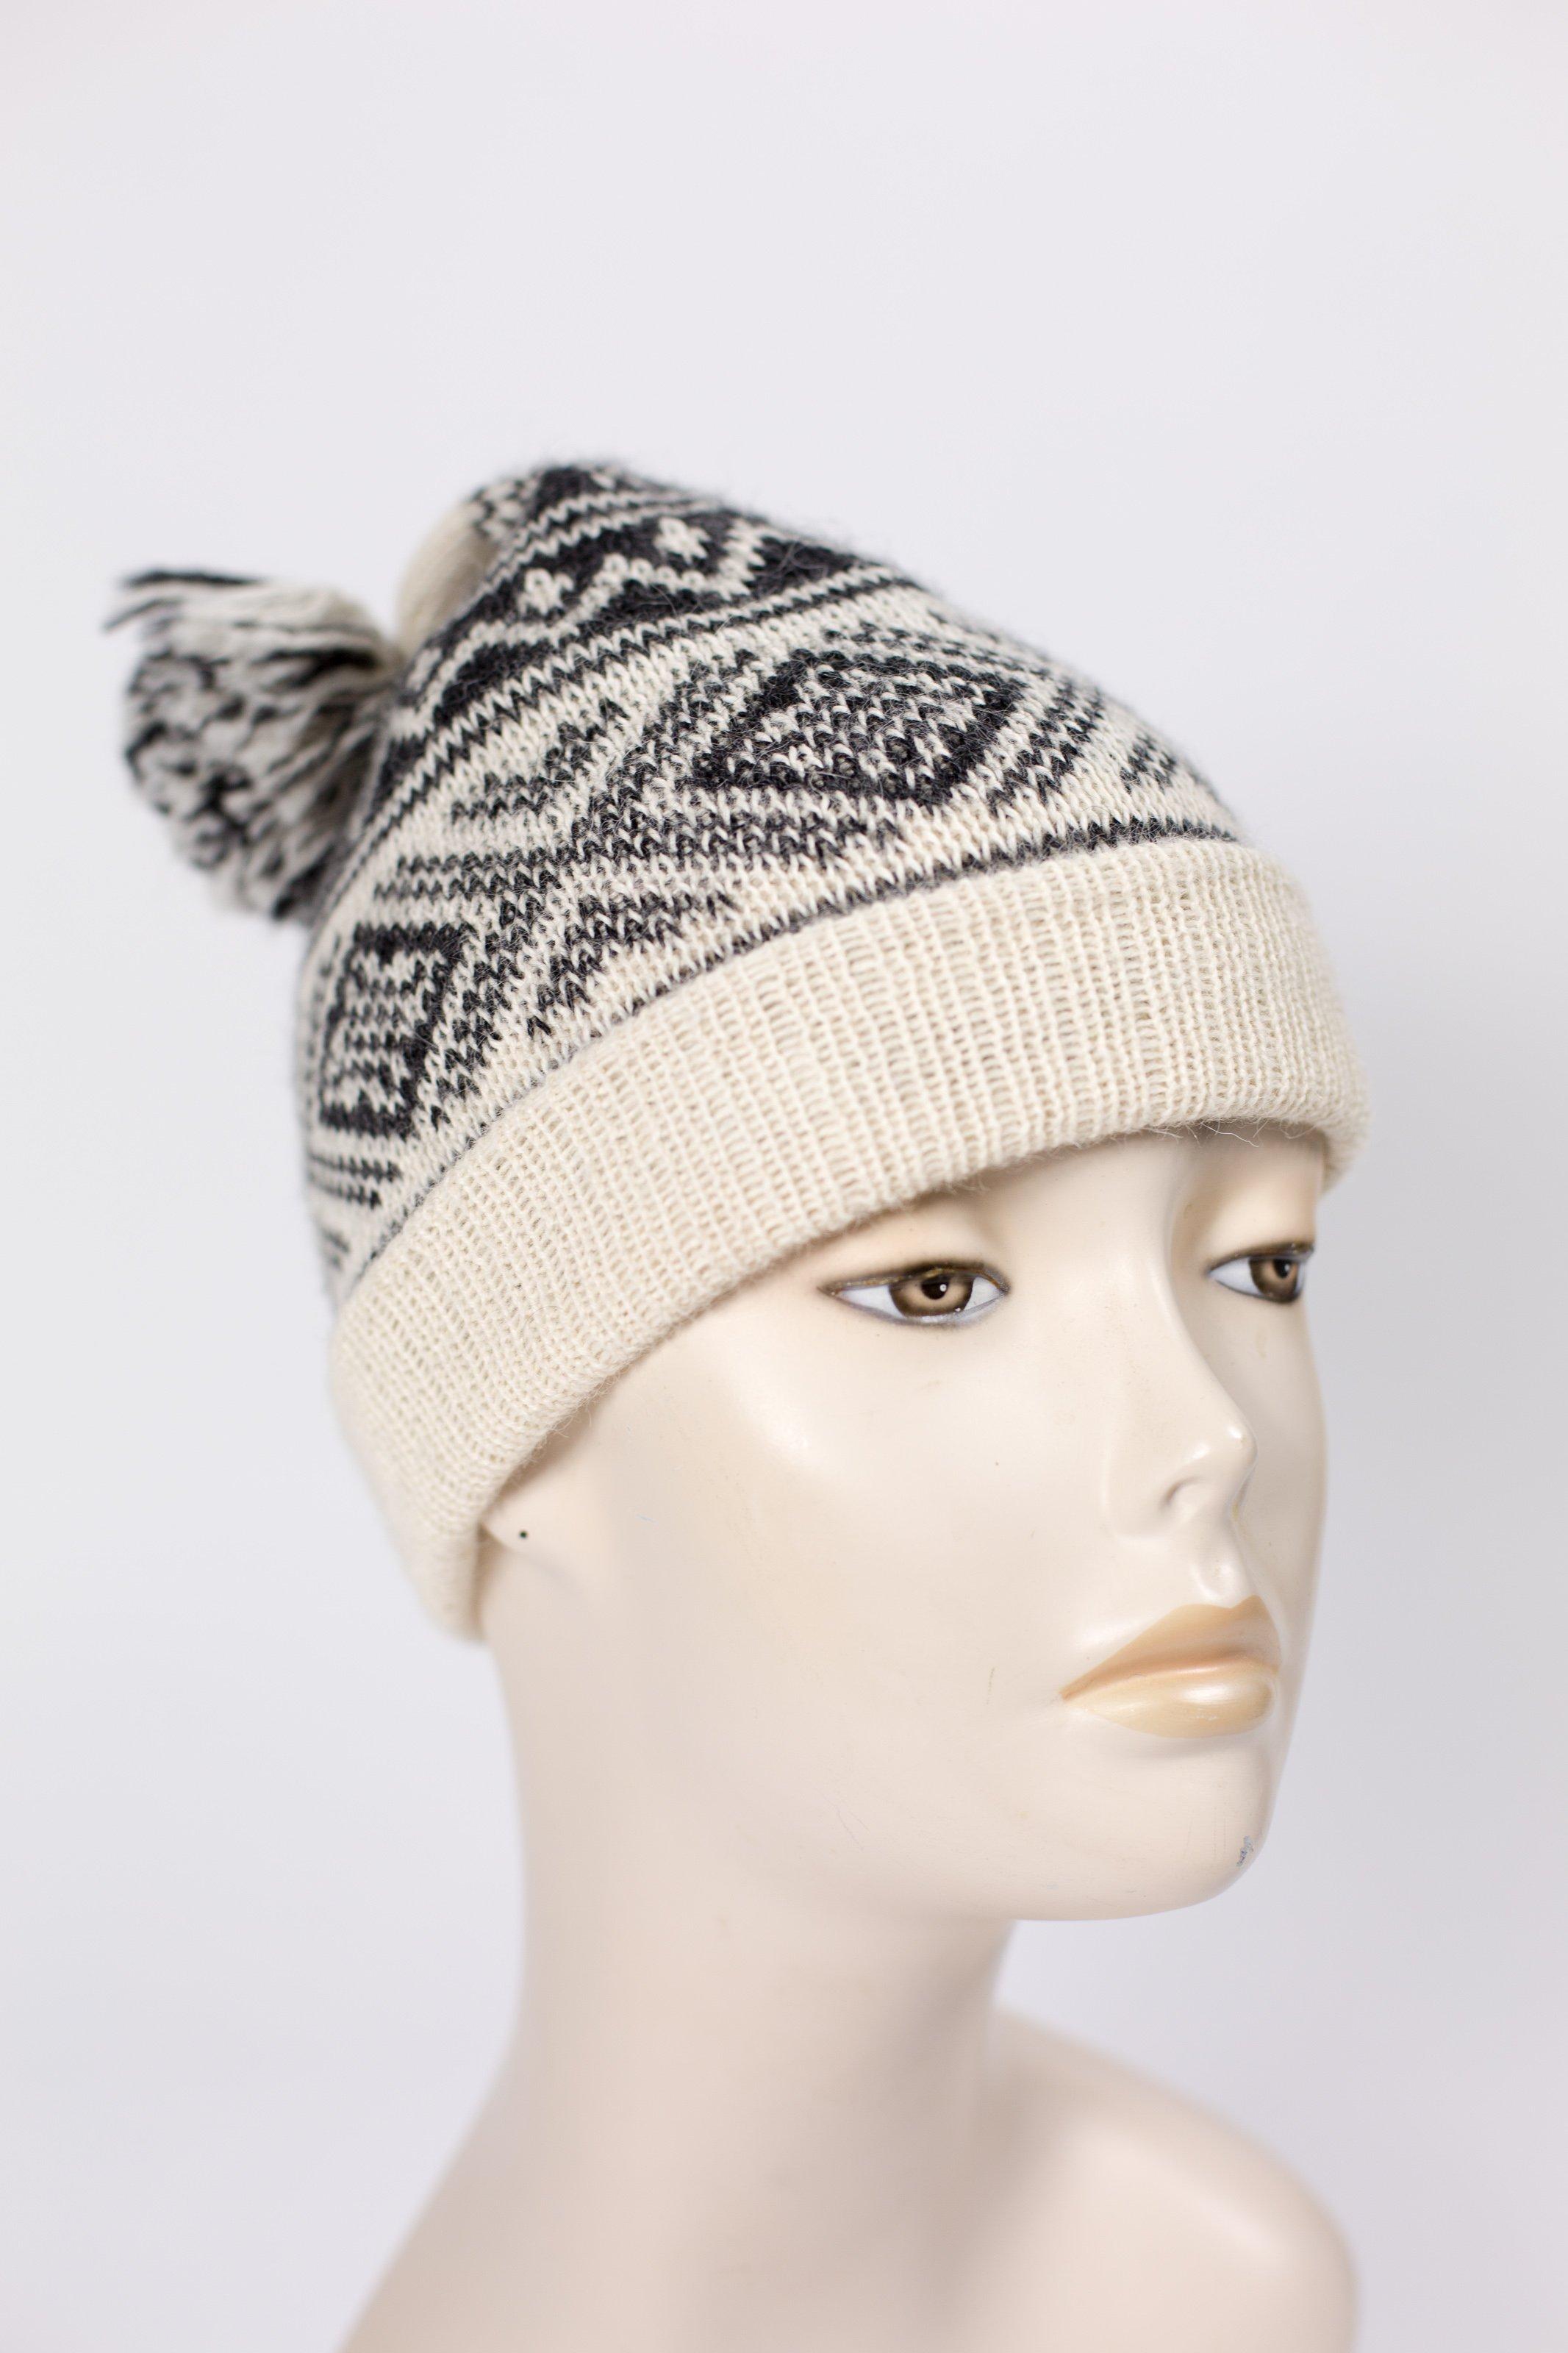 Fair Isle knitted hat in quality alpaca - Alpaca Annie, last few in ...